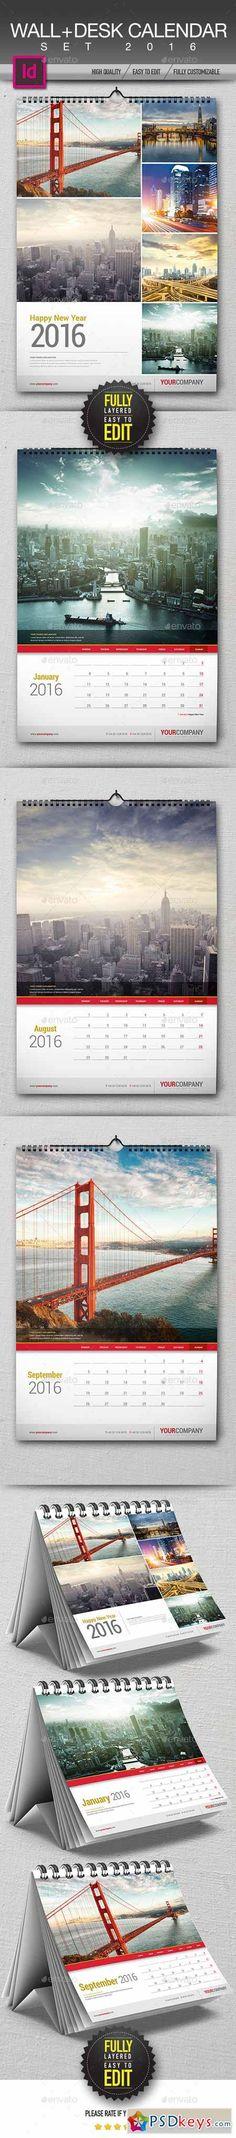 Calendars Vol 2 Calendar design, Print templates and Font logo - indesign calendar template